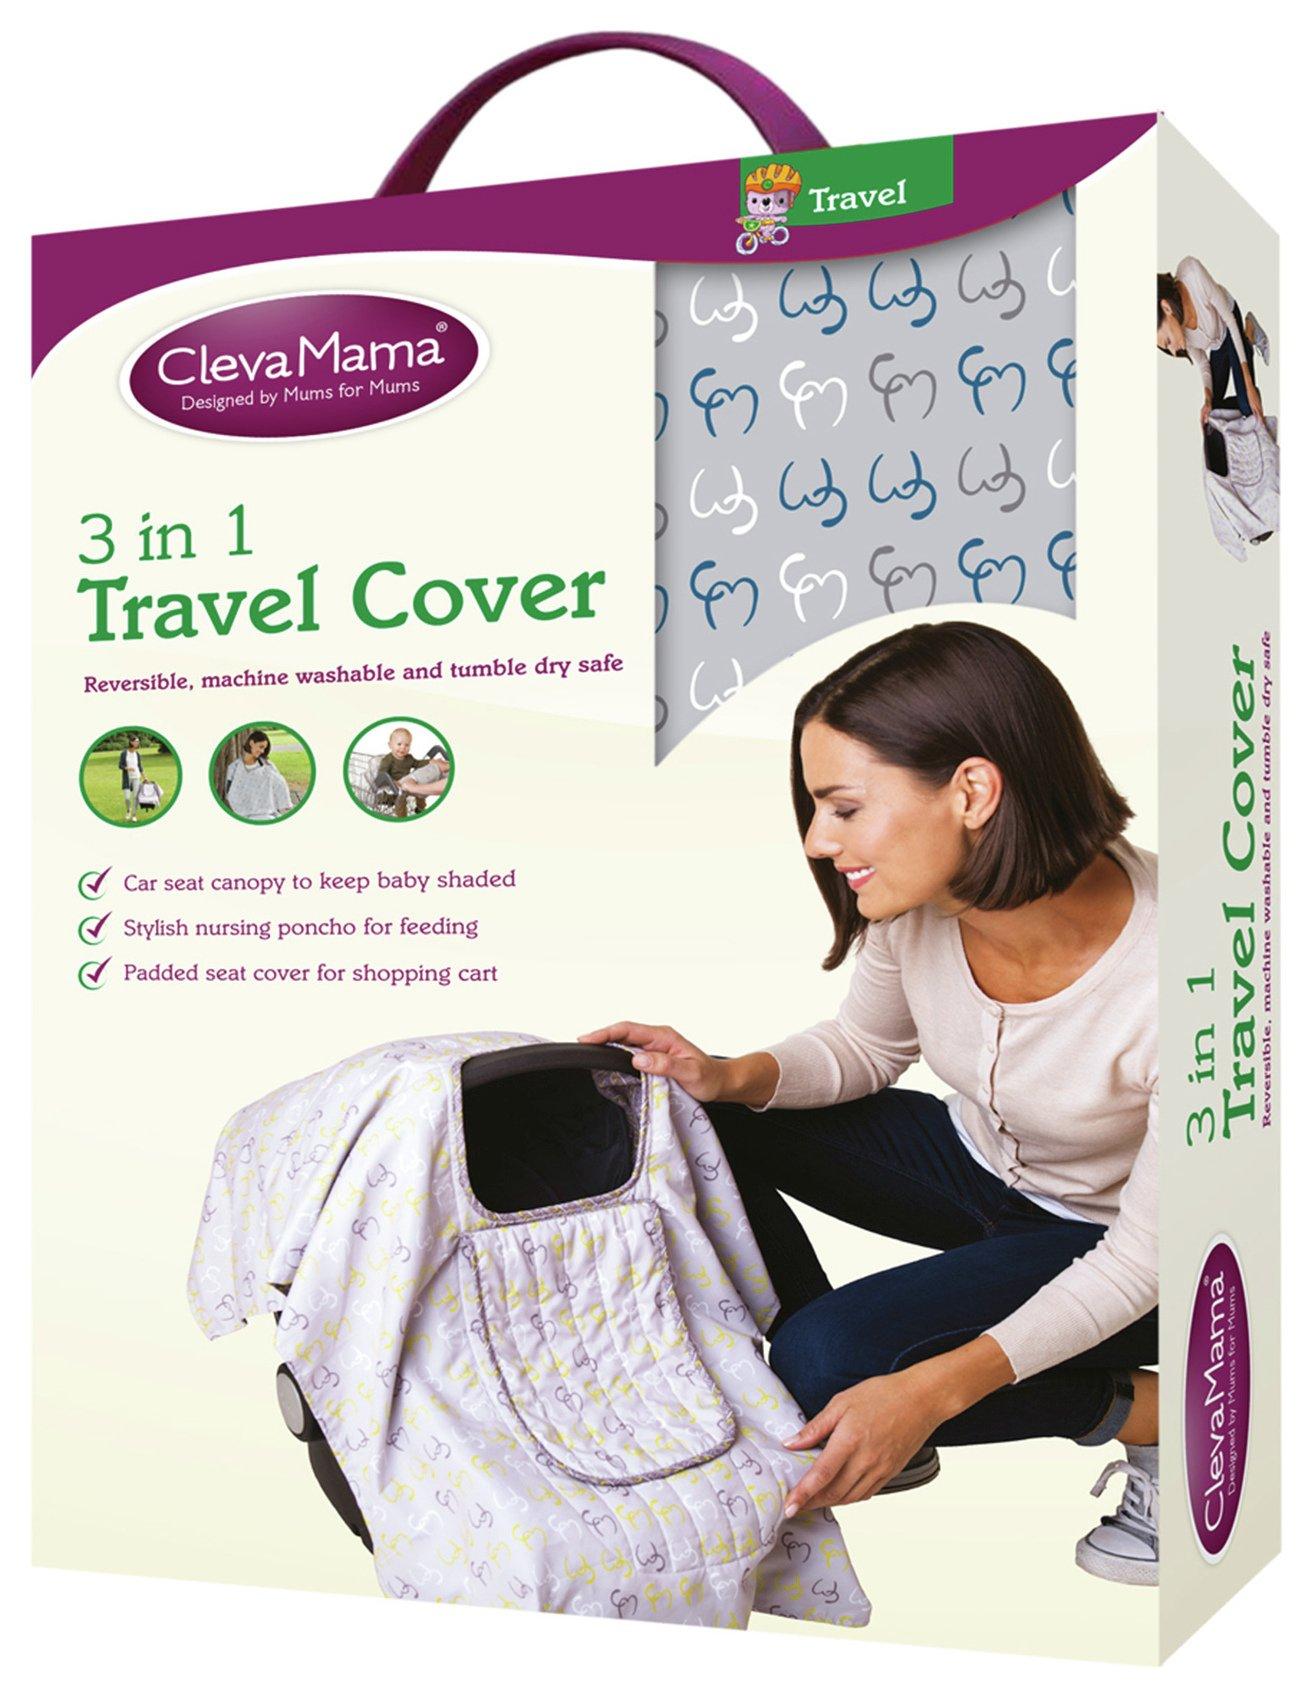 Image of Clevamama 3 in 1 Travel Cover - Capri.